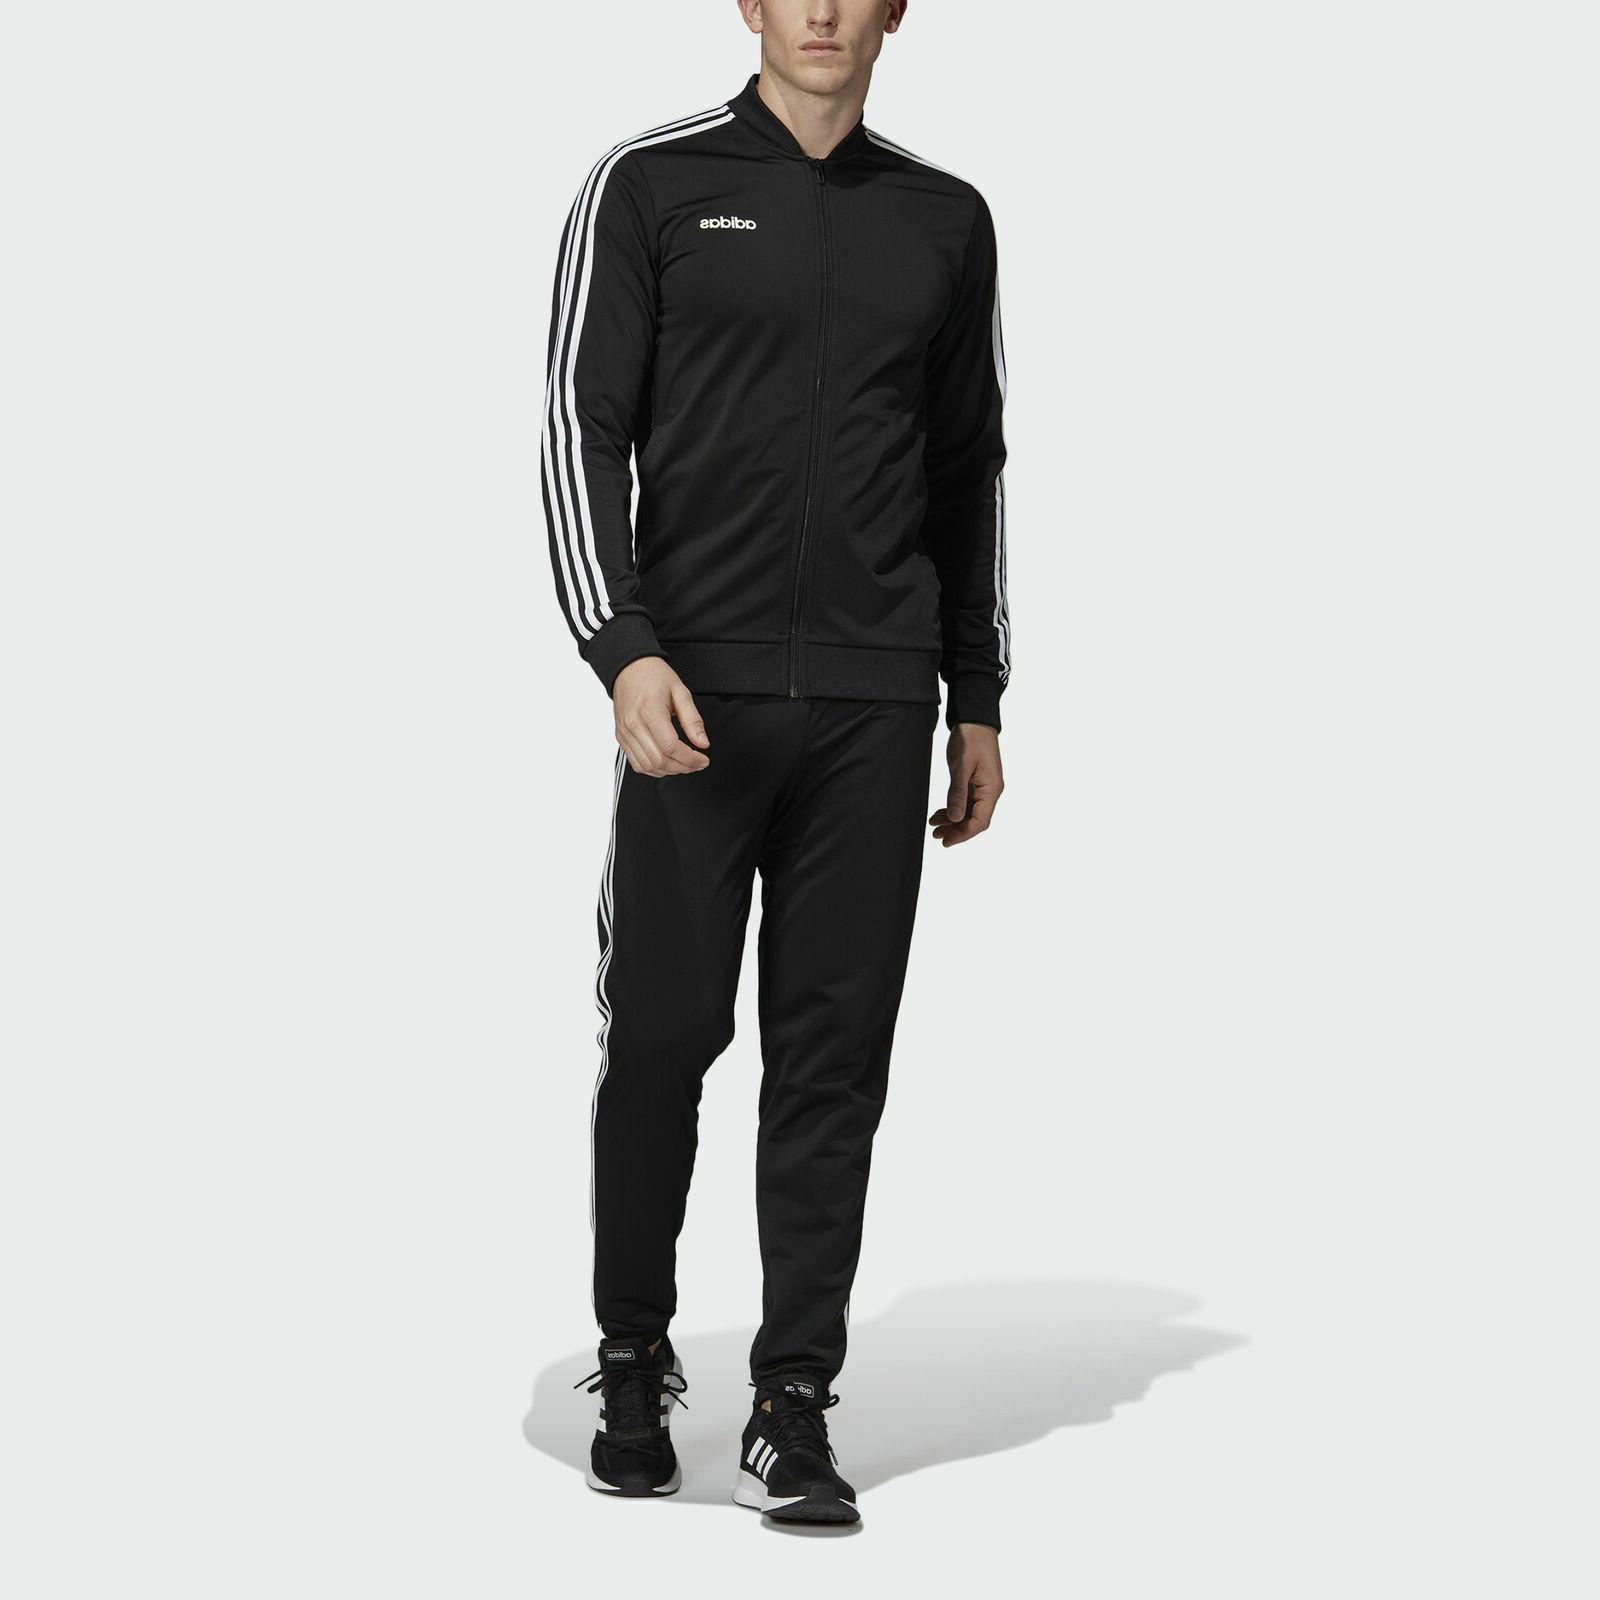 adidas Men's Suit